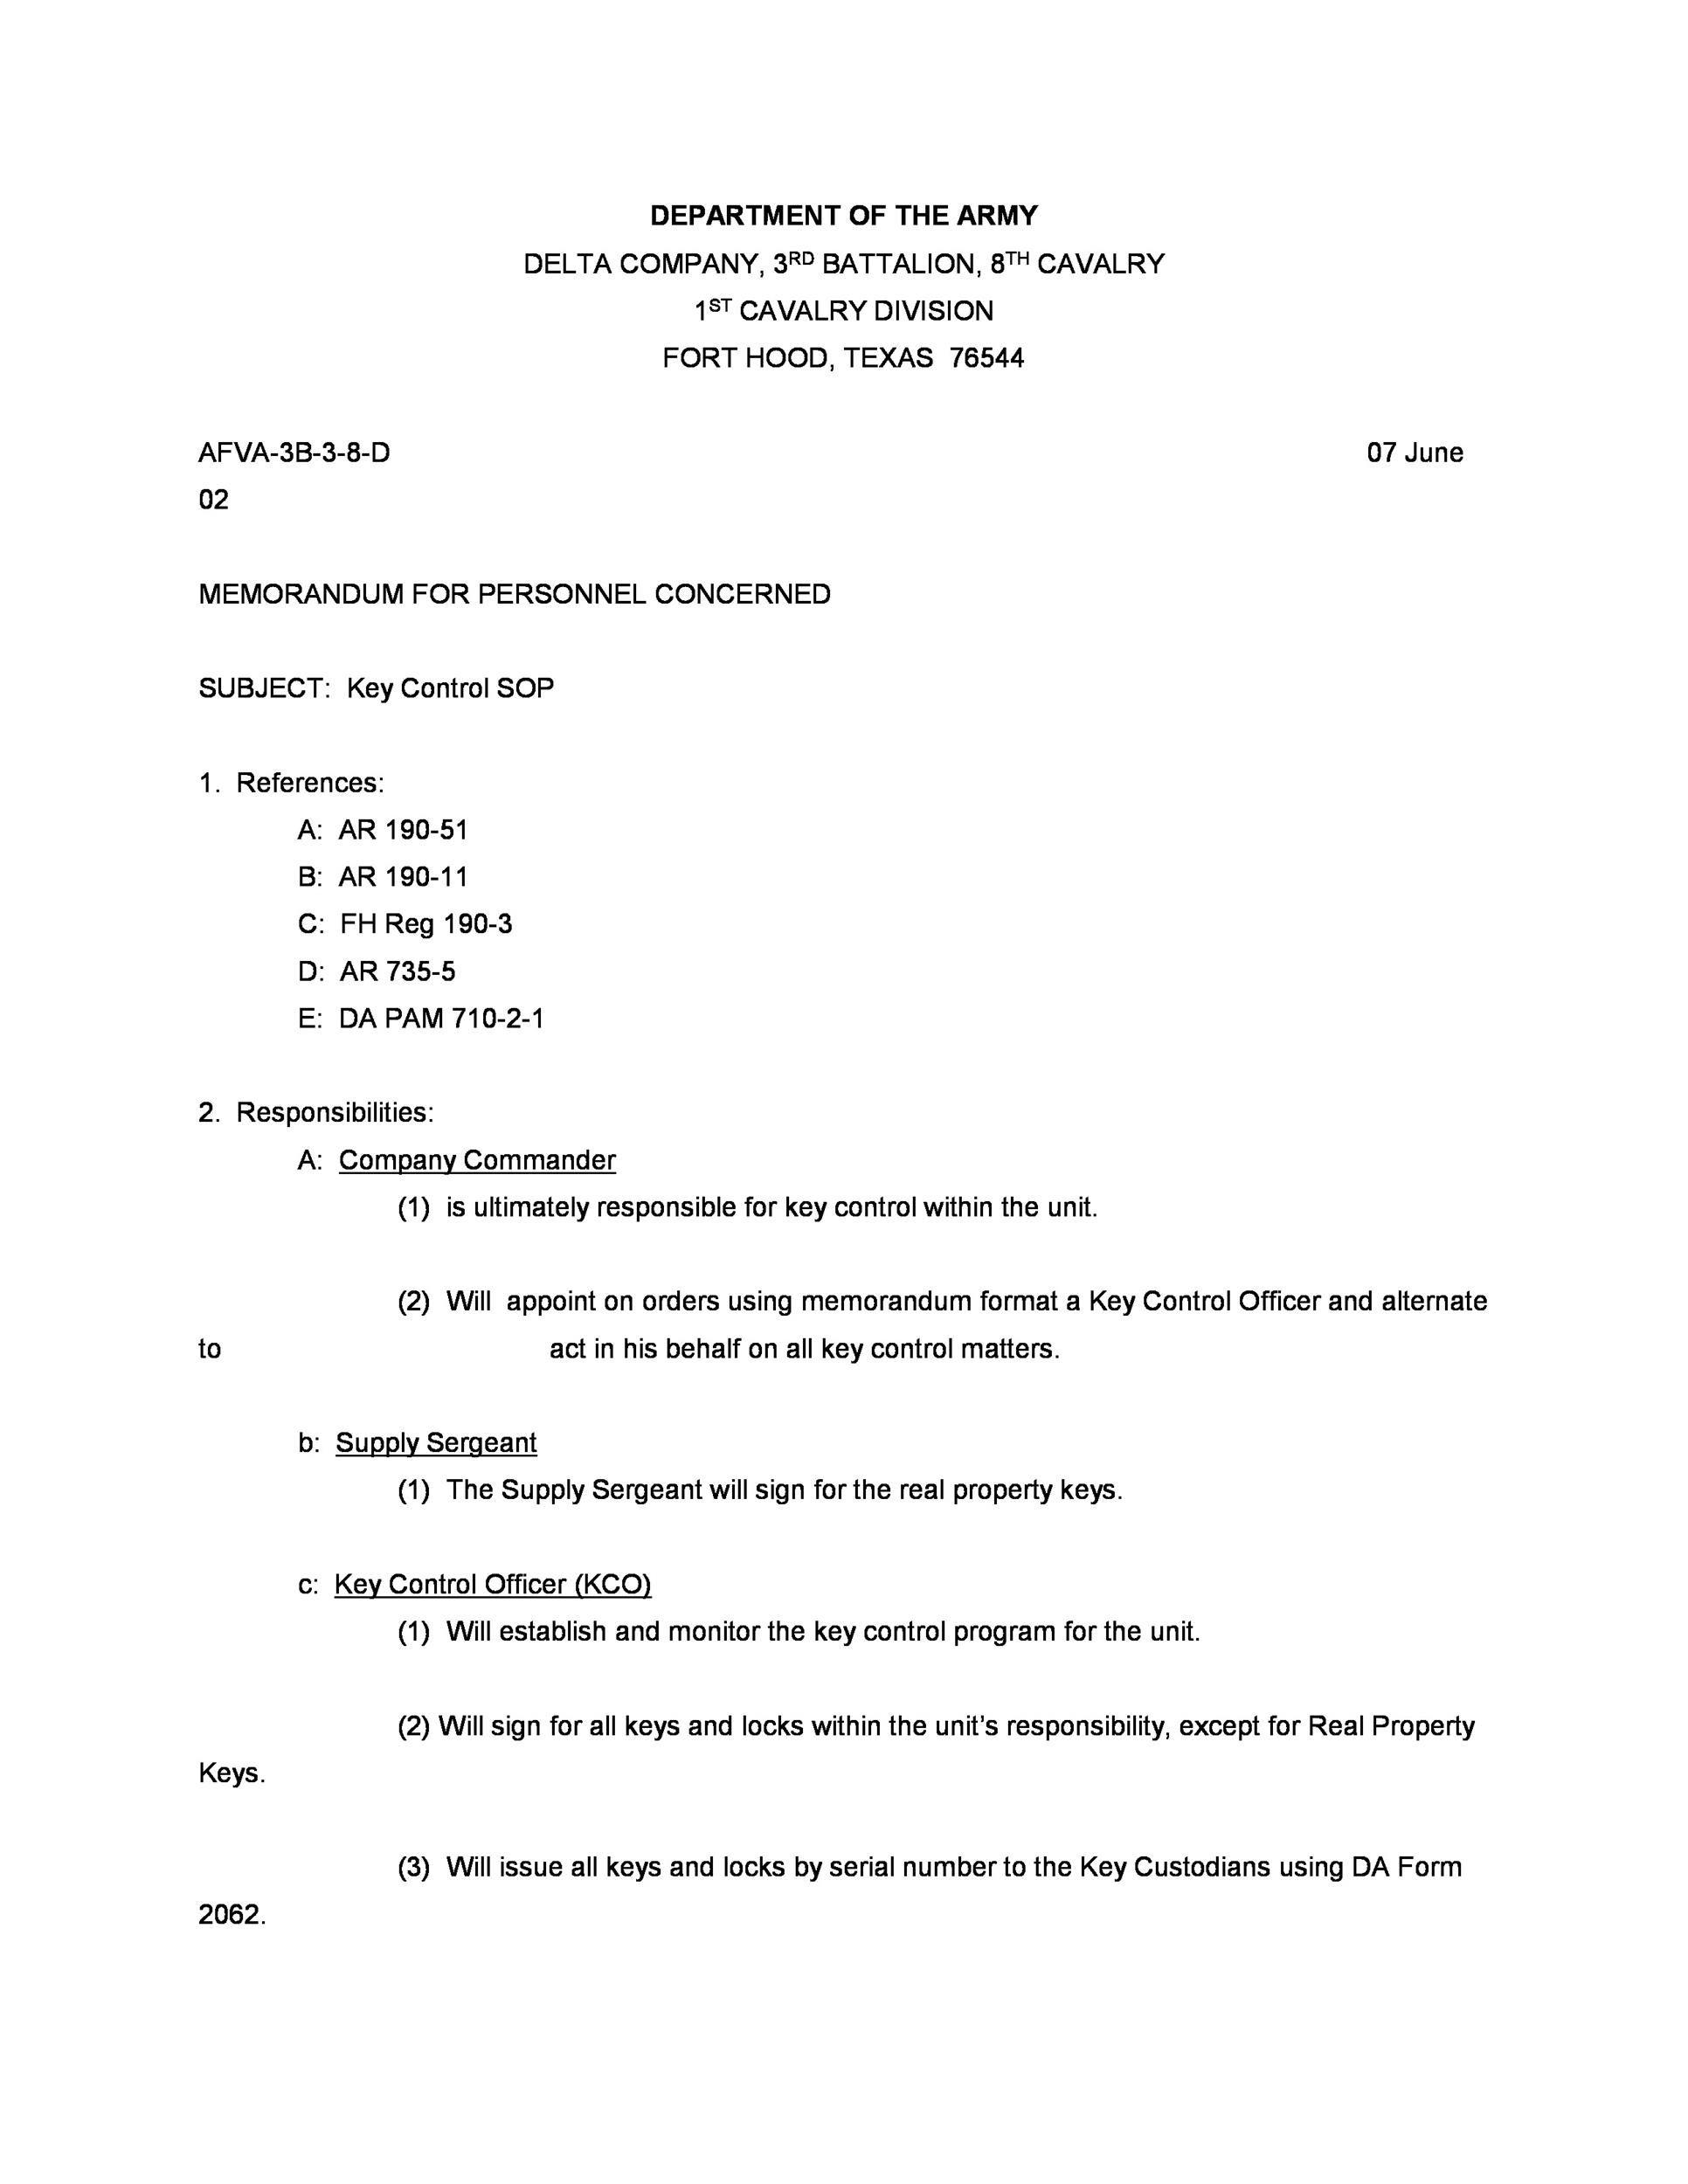 008 Stirring Private Placement Memorandum Outline High Definition  Template Offering Sample FilmFull